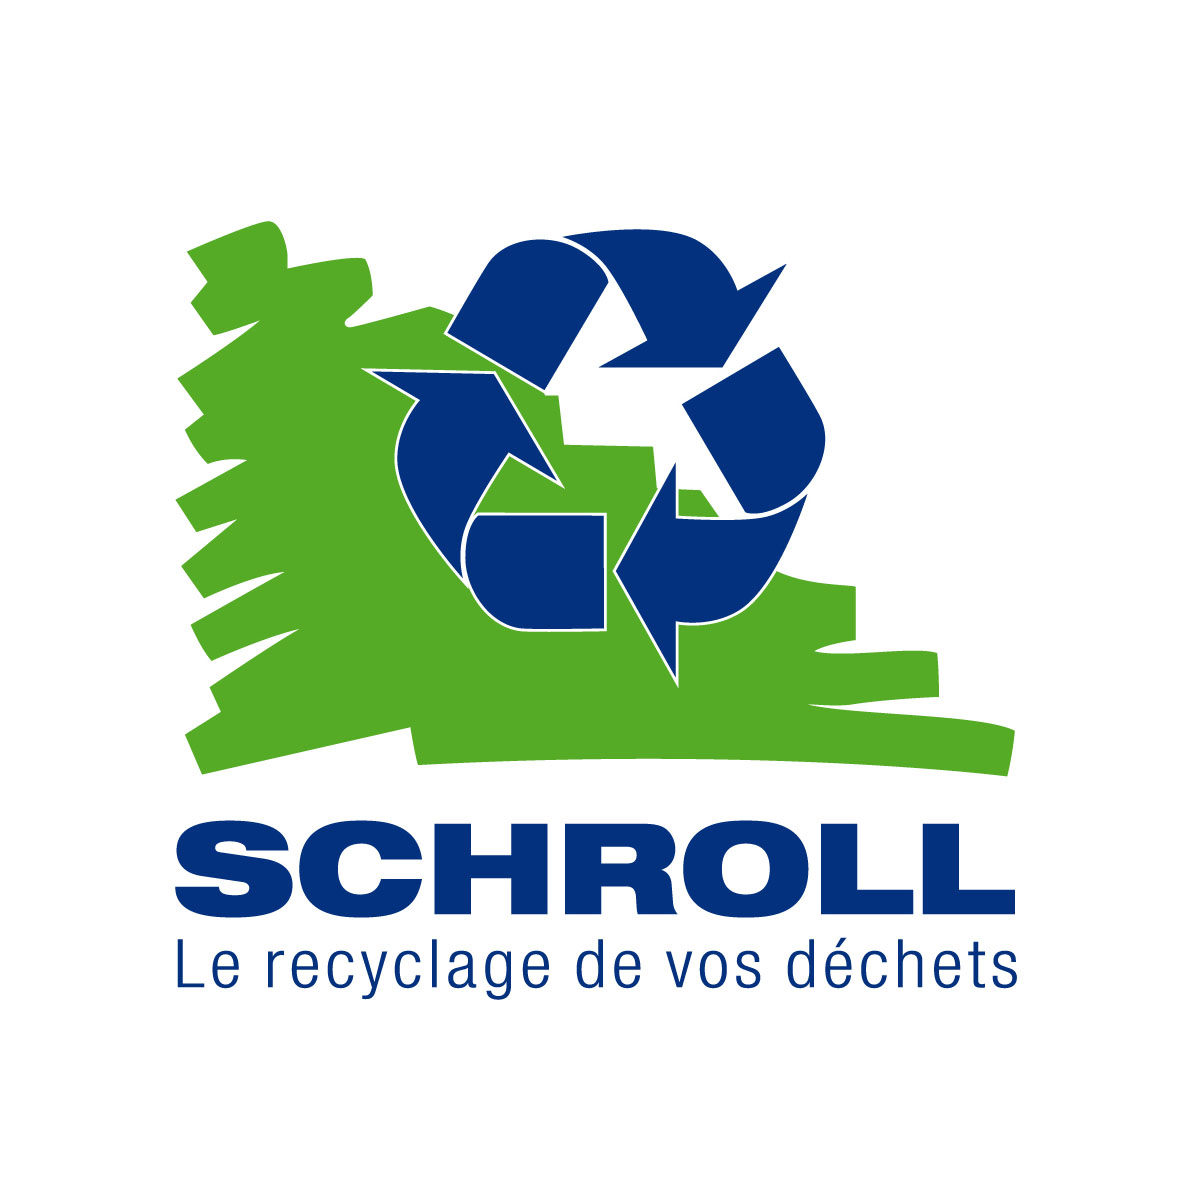 schroll_logo_2011